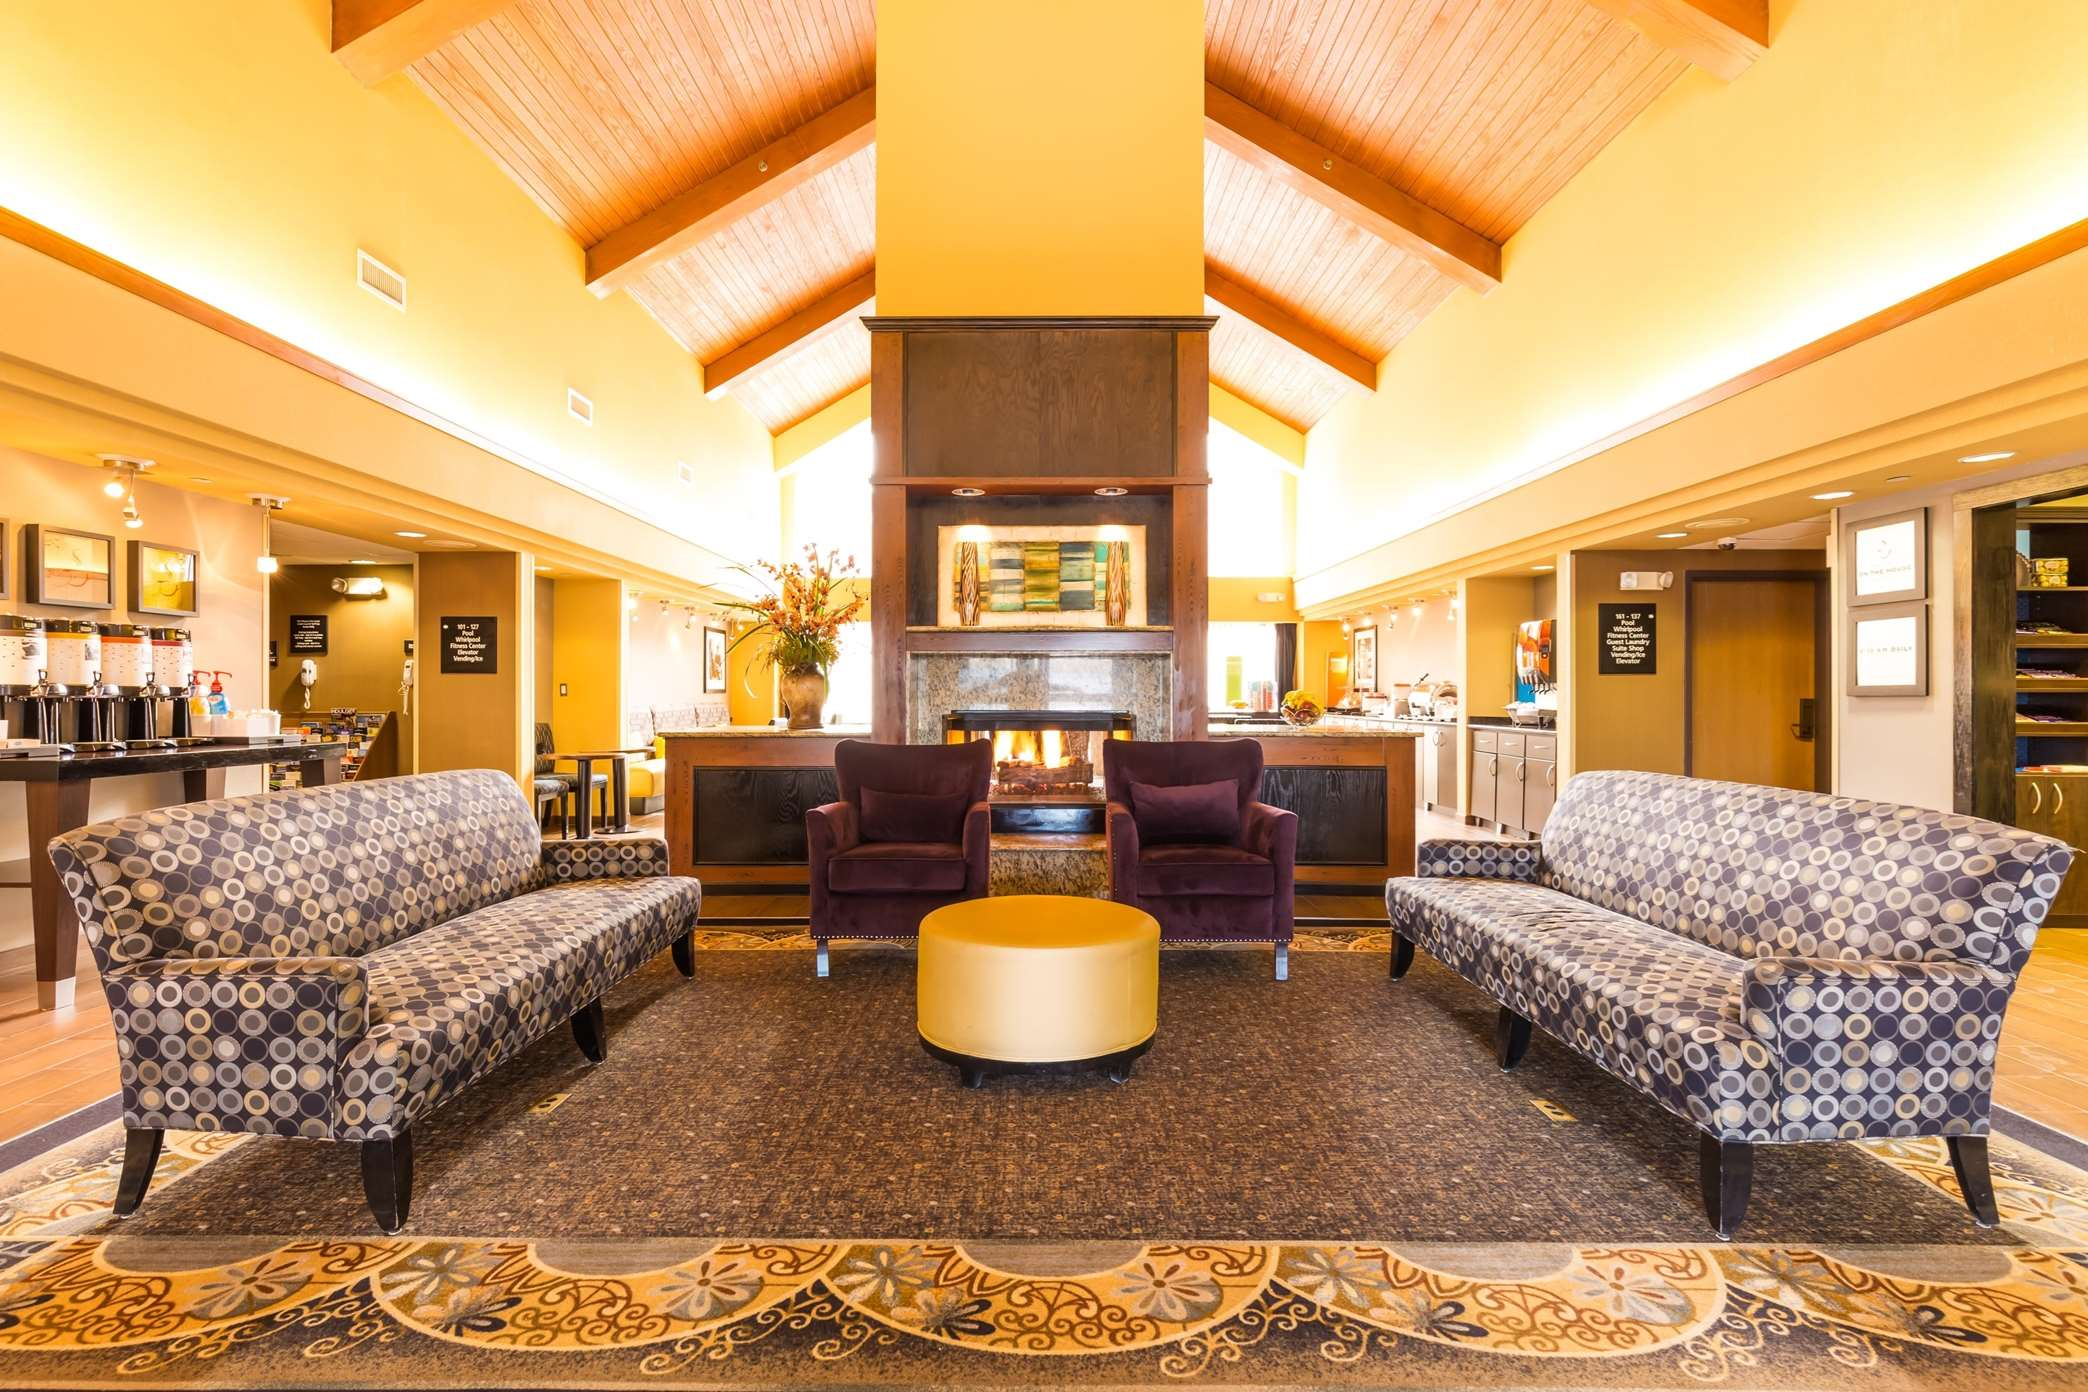 Hampton Inn & Suites Chicago/Hoffman Estates image 22